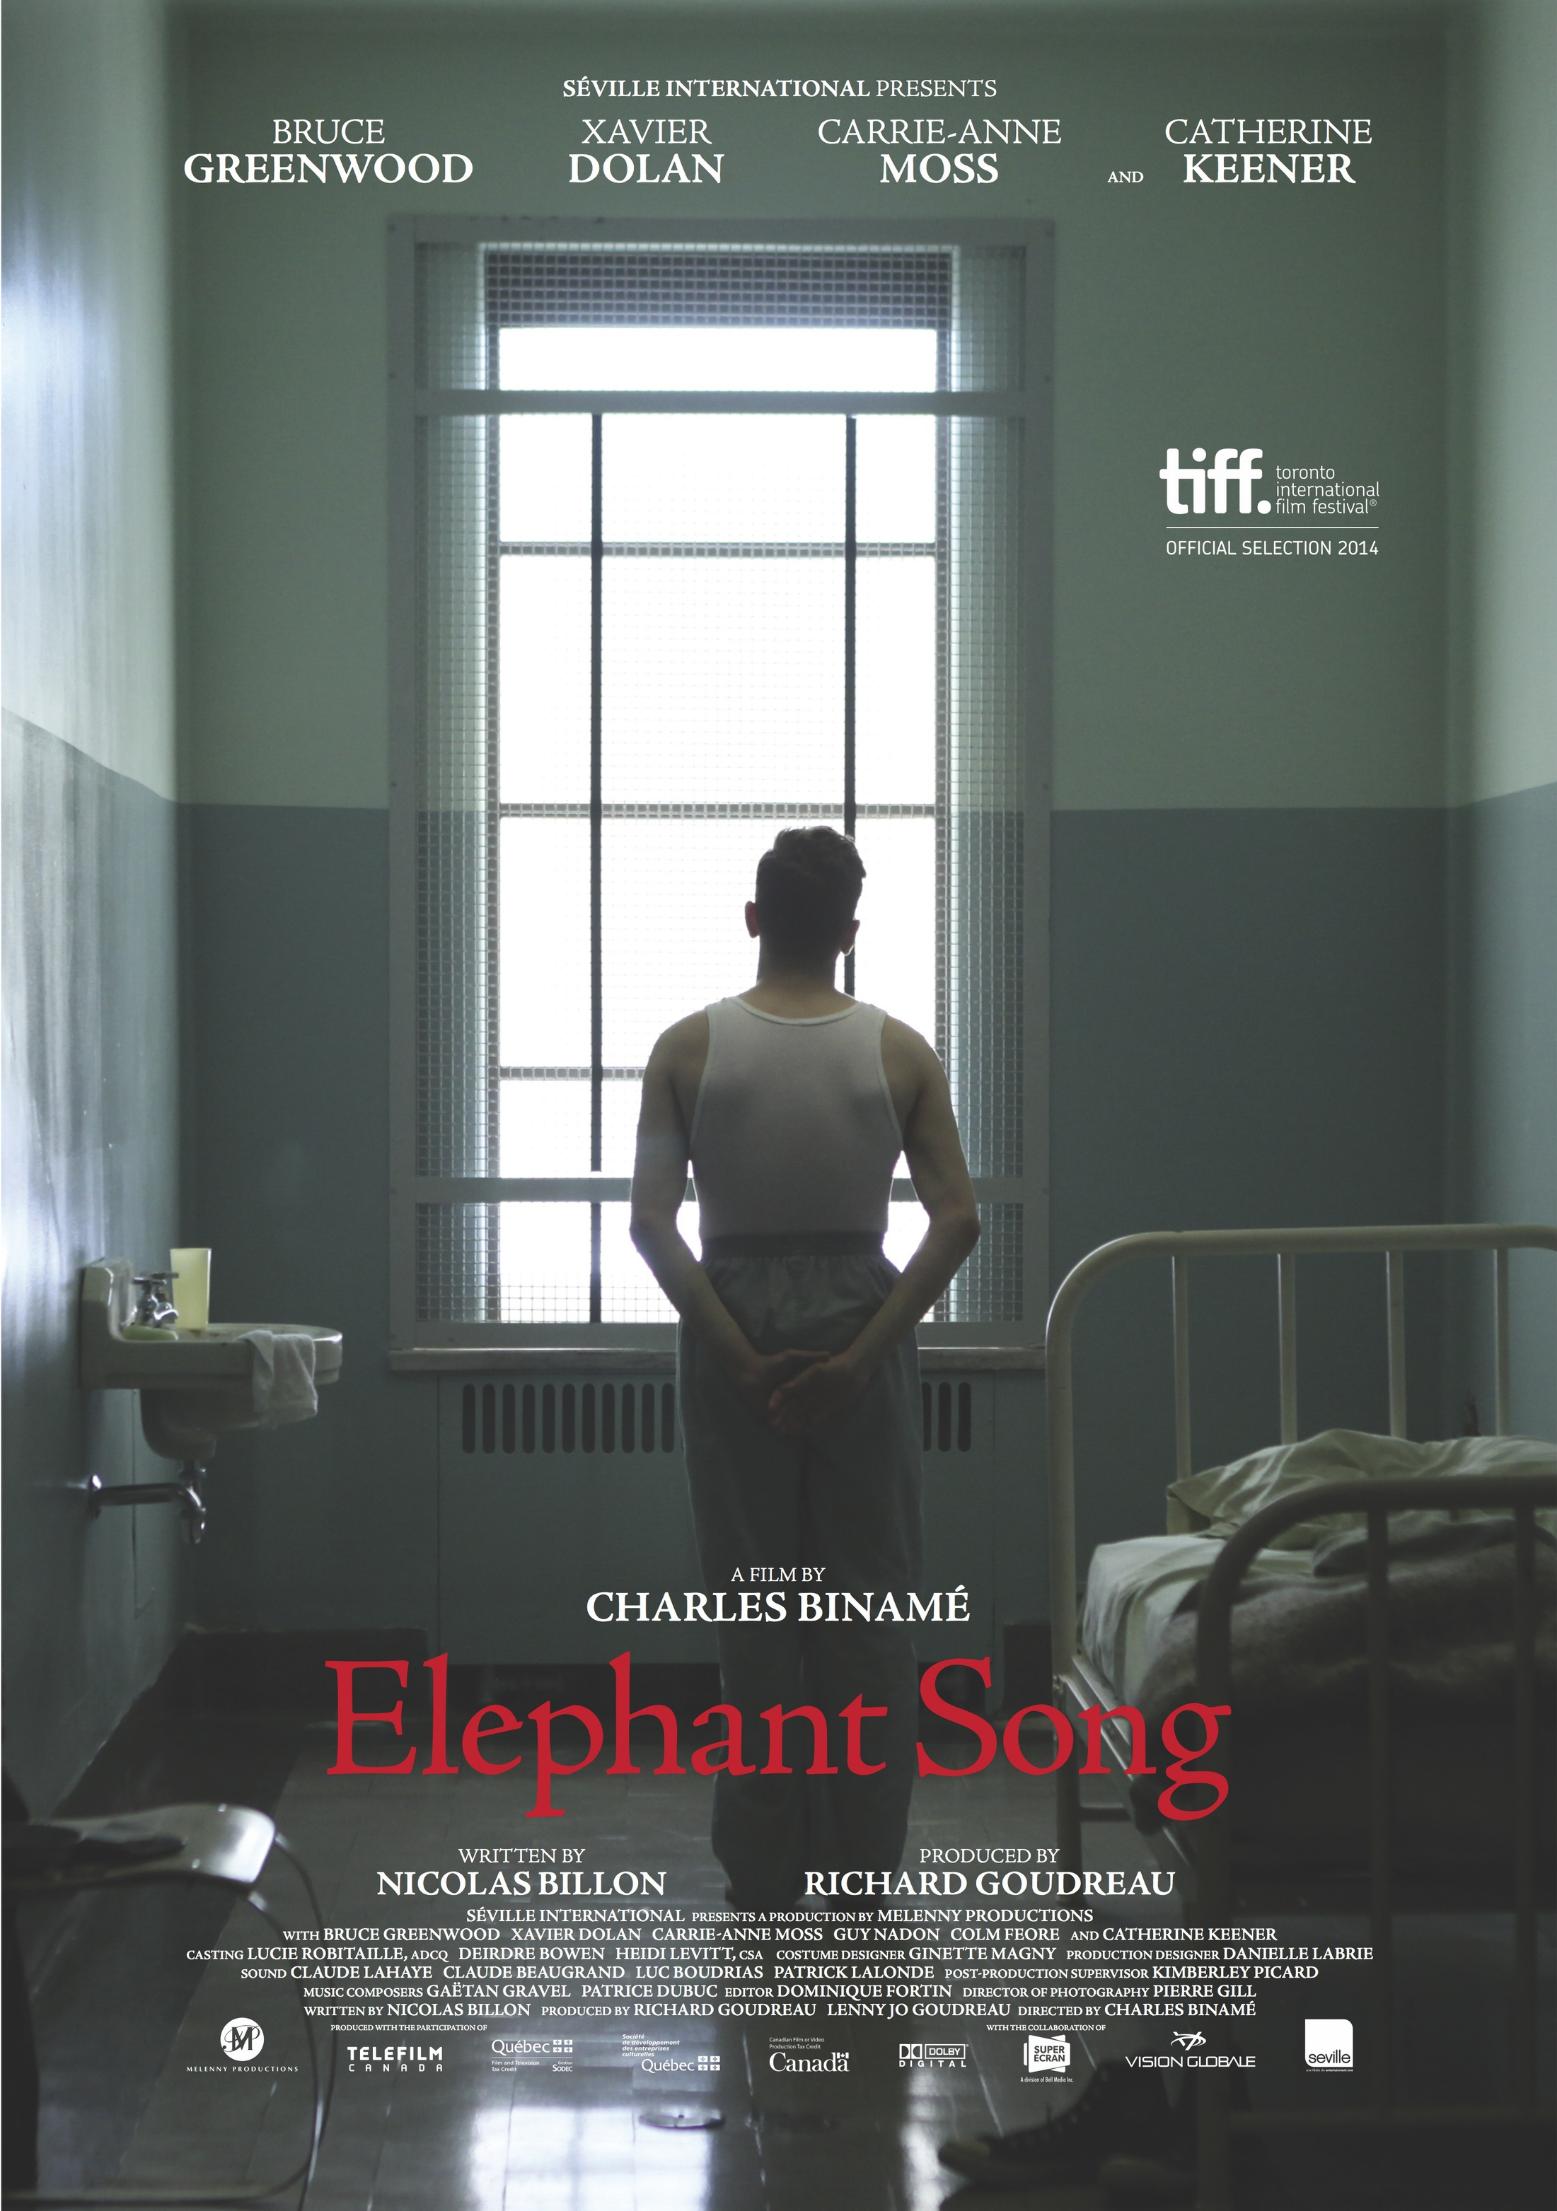 Elephant song art